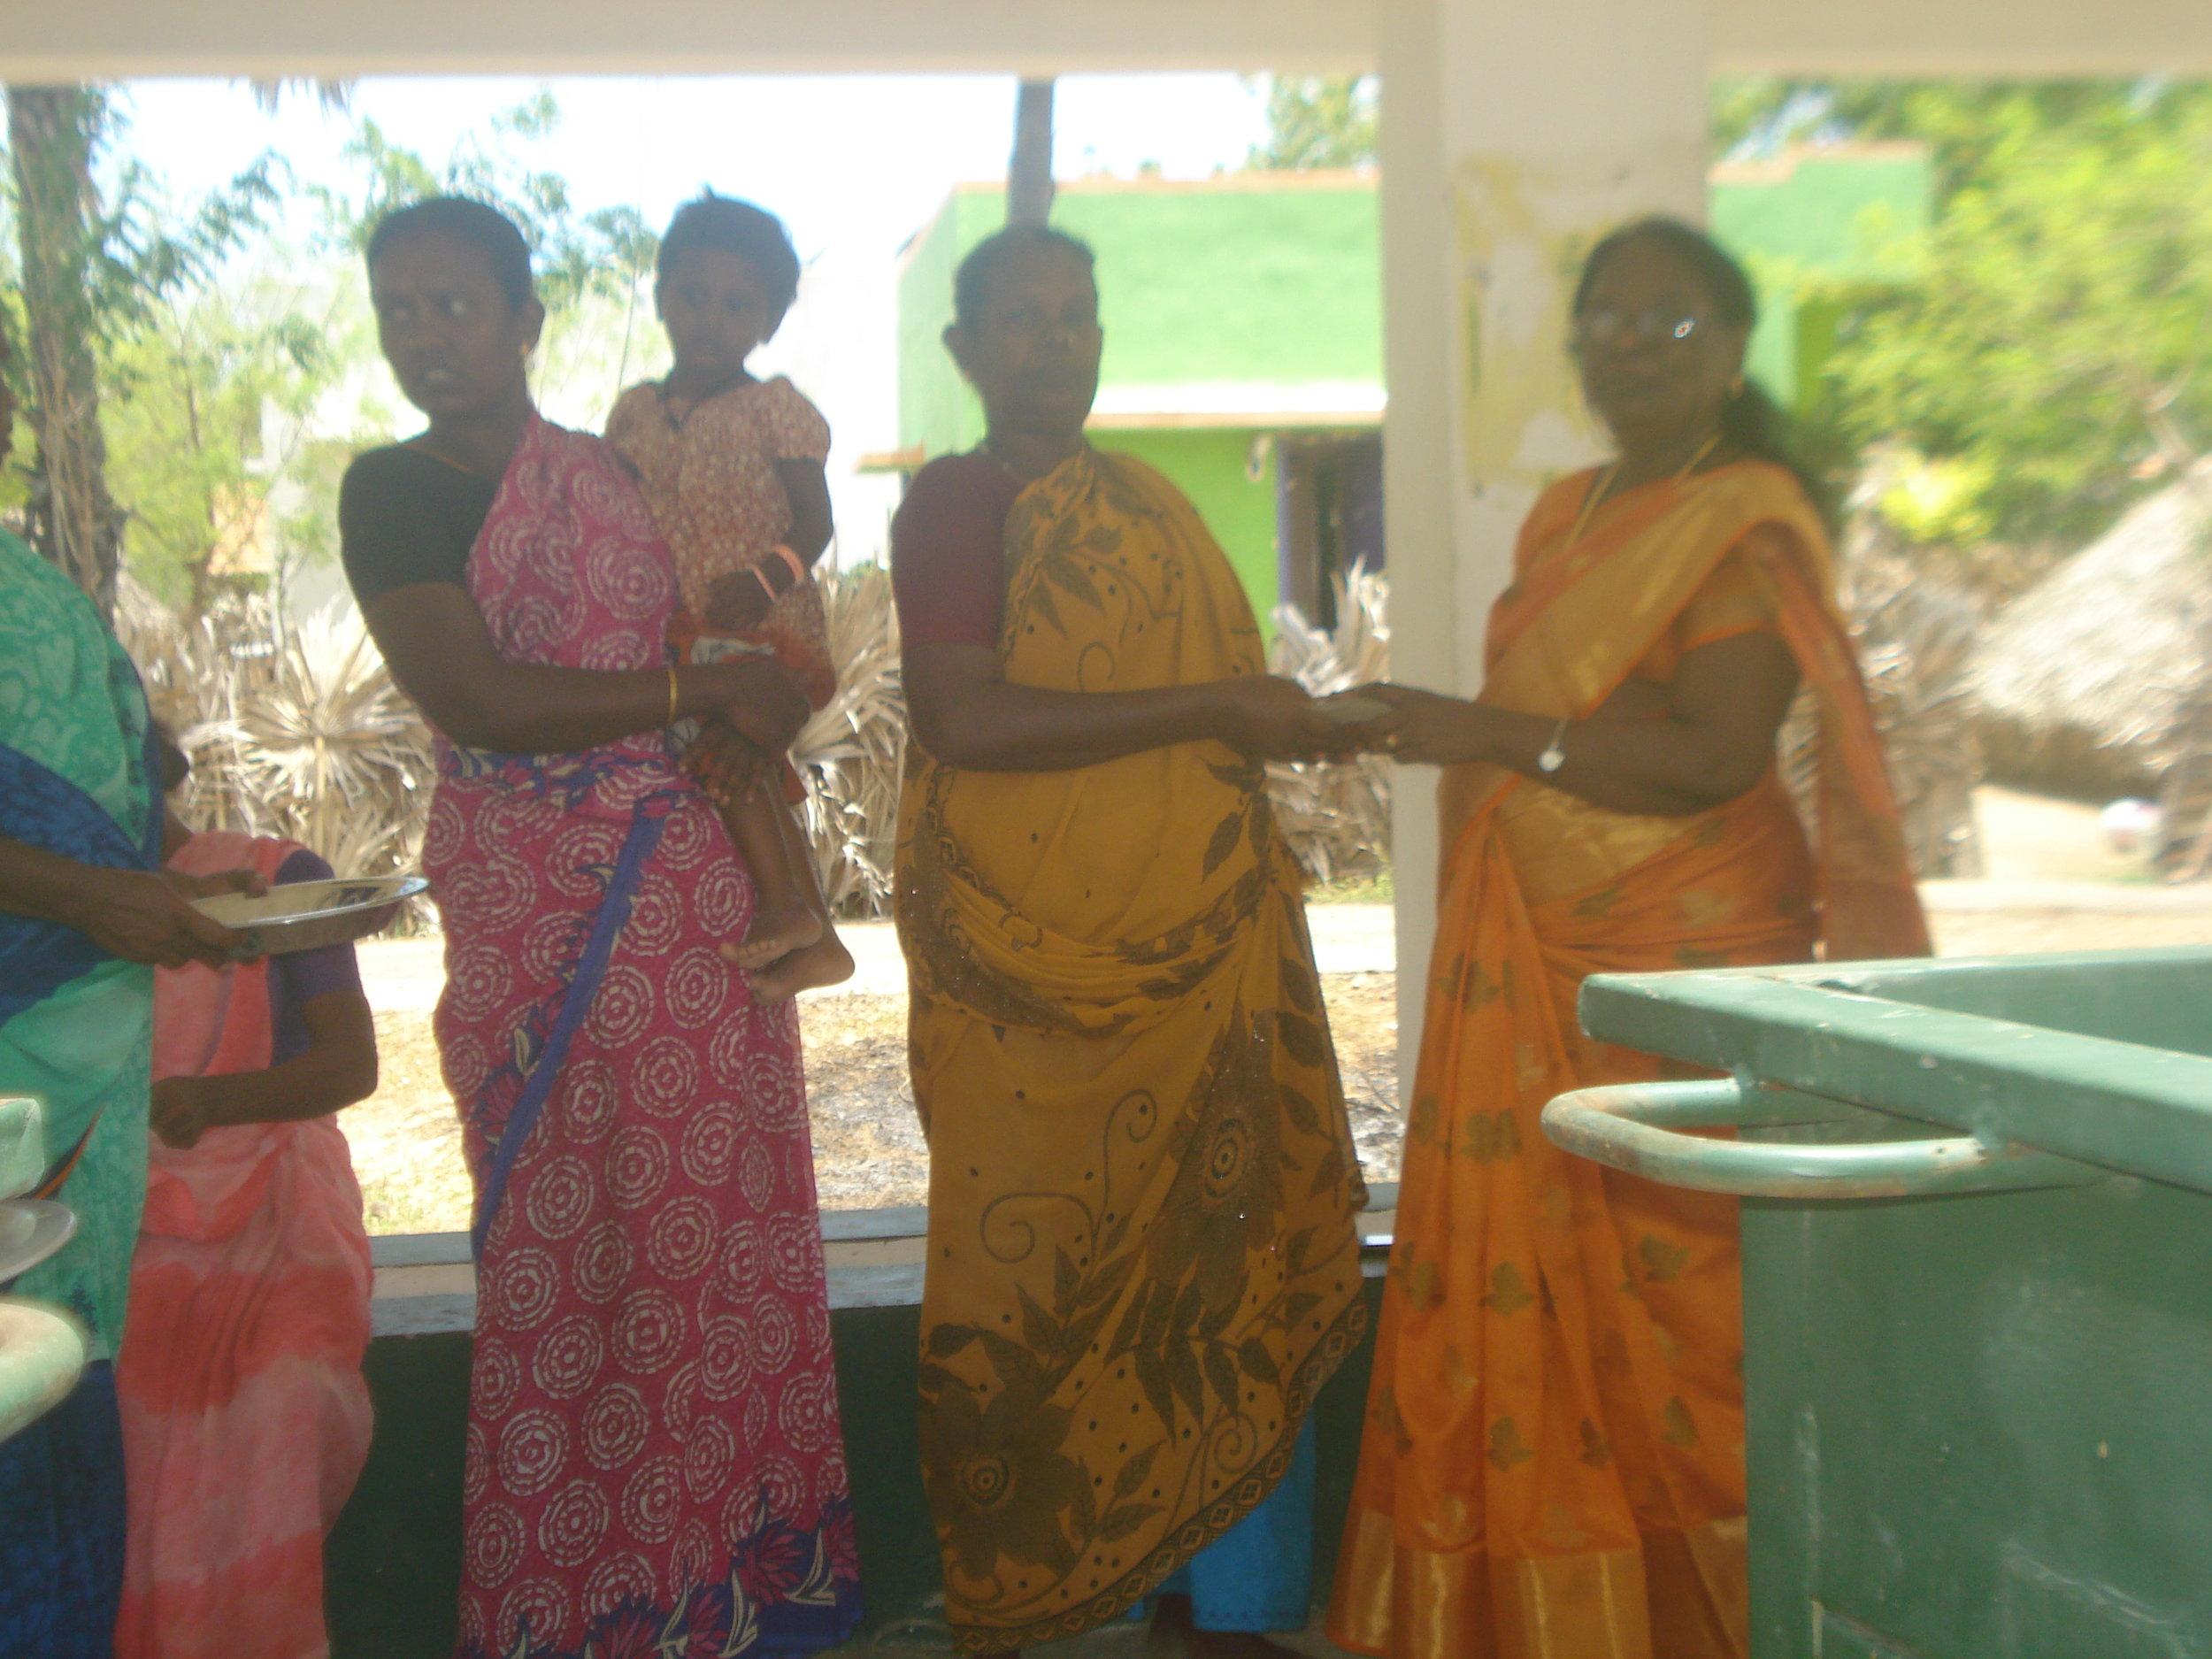 Health Coordinator Jansi Rani distributing credit assistance to Ms. Sarojamary for sea weed program.